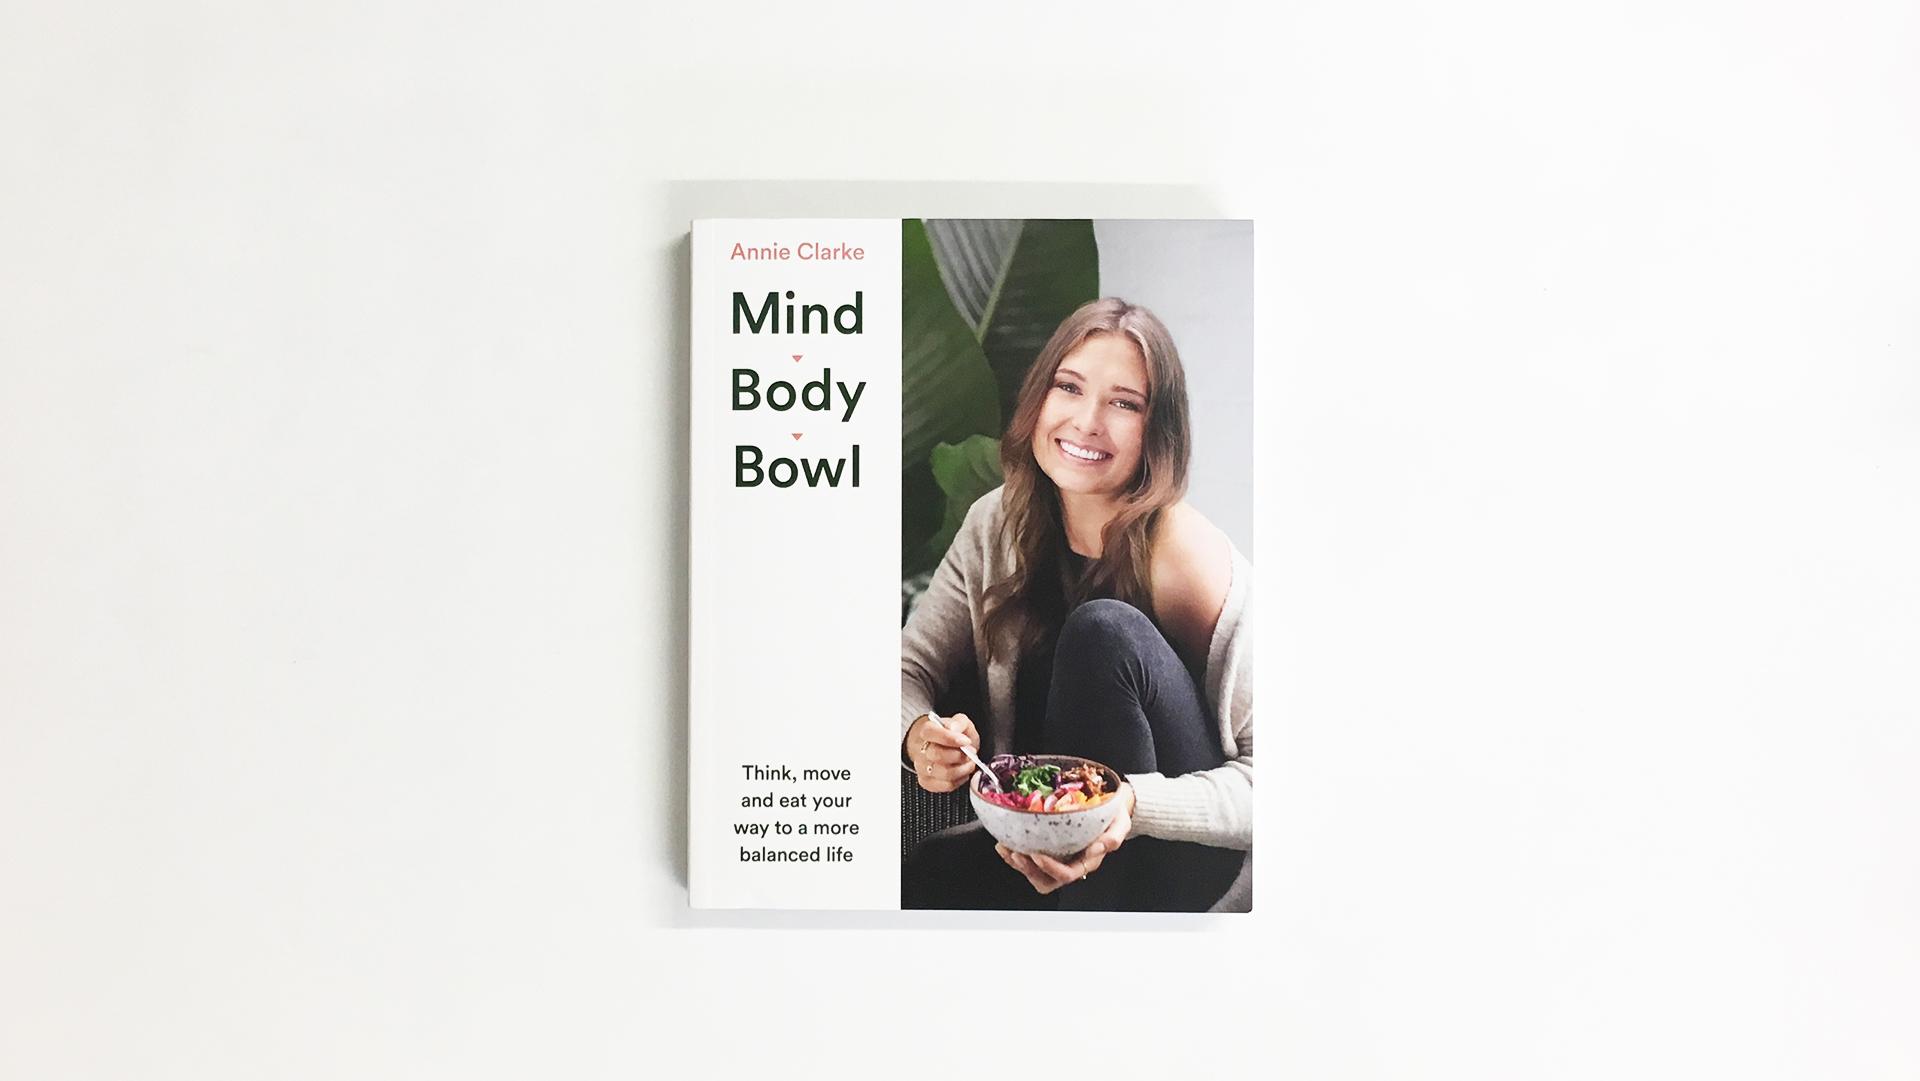 Mind Body Bowl book flat lay_16x9